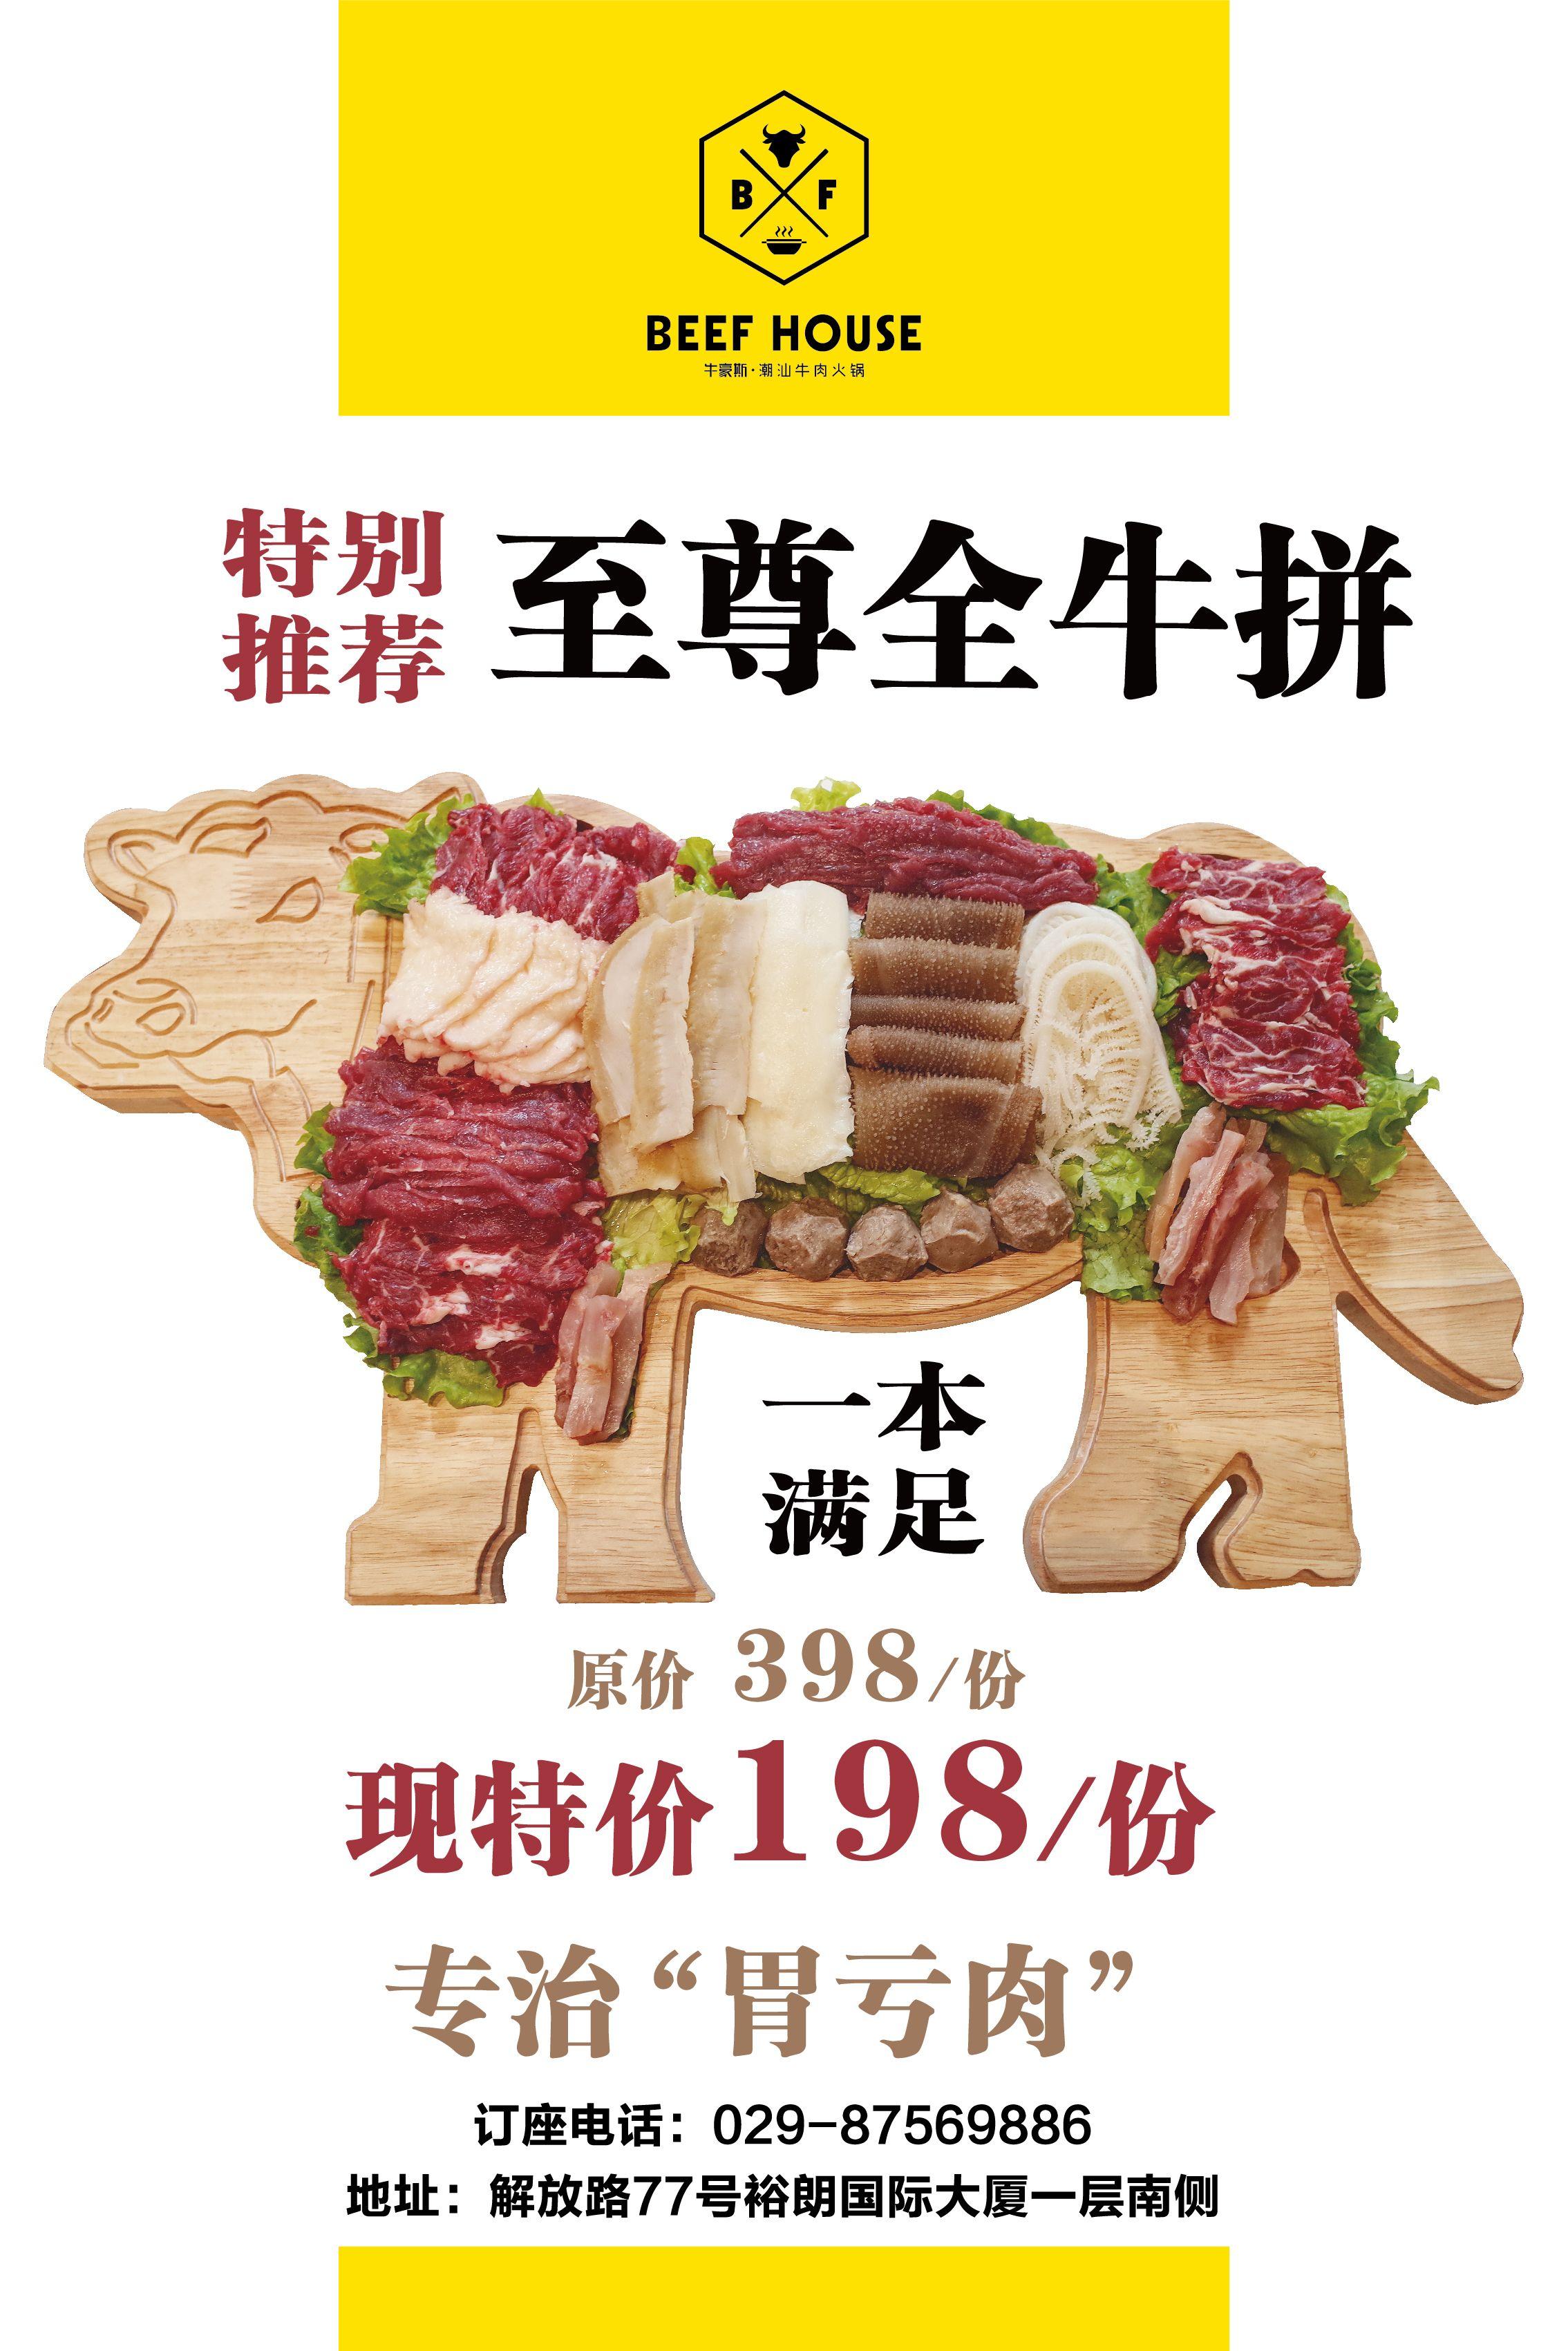 BeefHouse·牛豪斯潮汕牛肉火锅